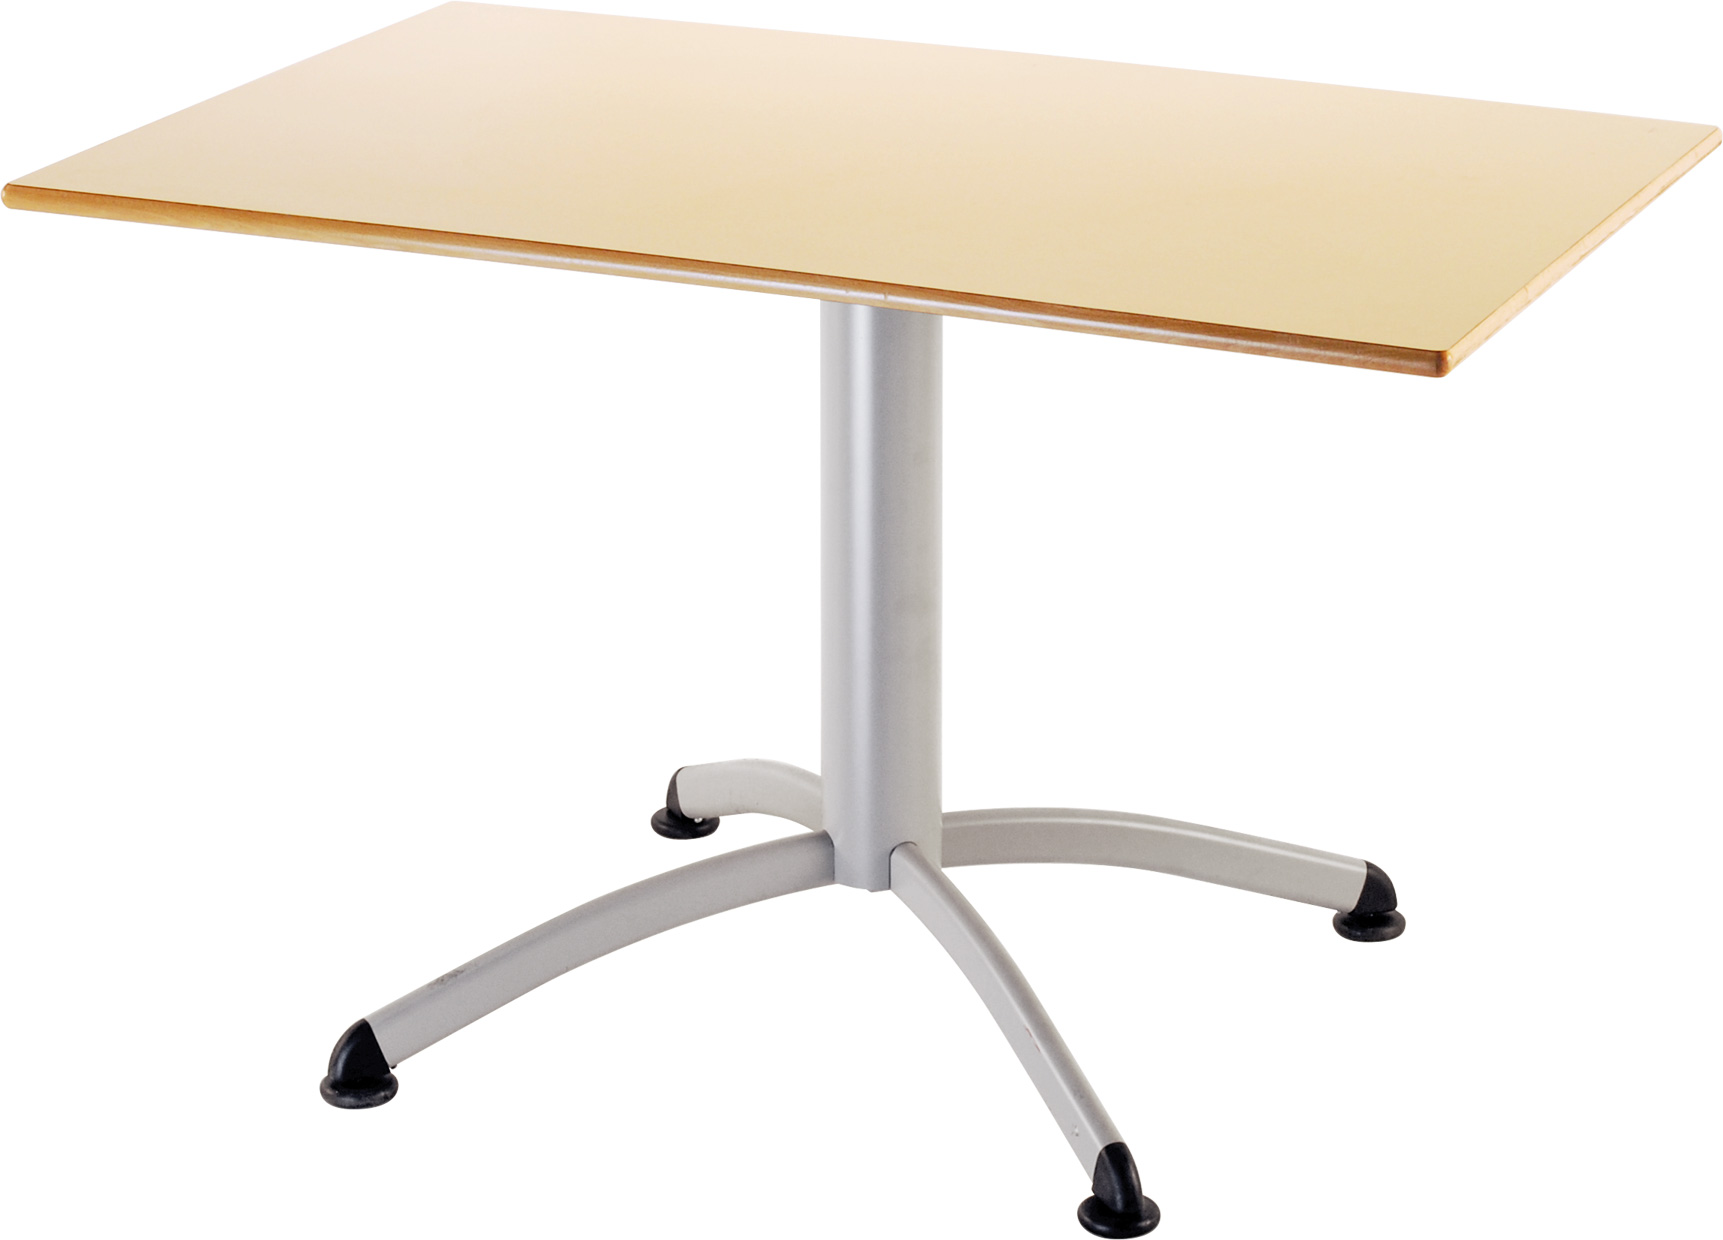 table de restauration zenith mobilier goz. Black Bedroom Furniture Sets. Home Design Ideas